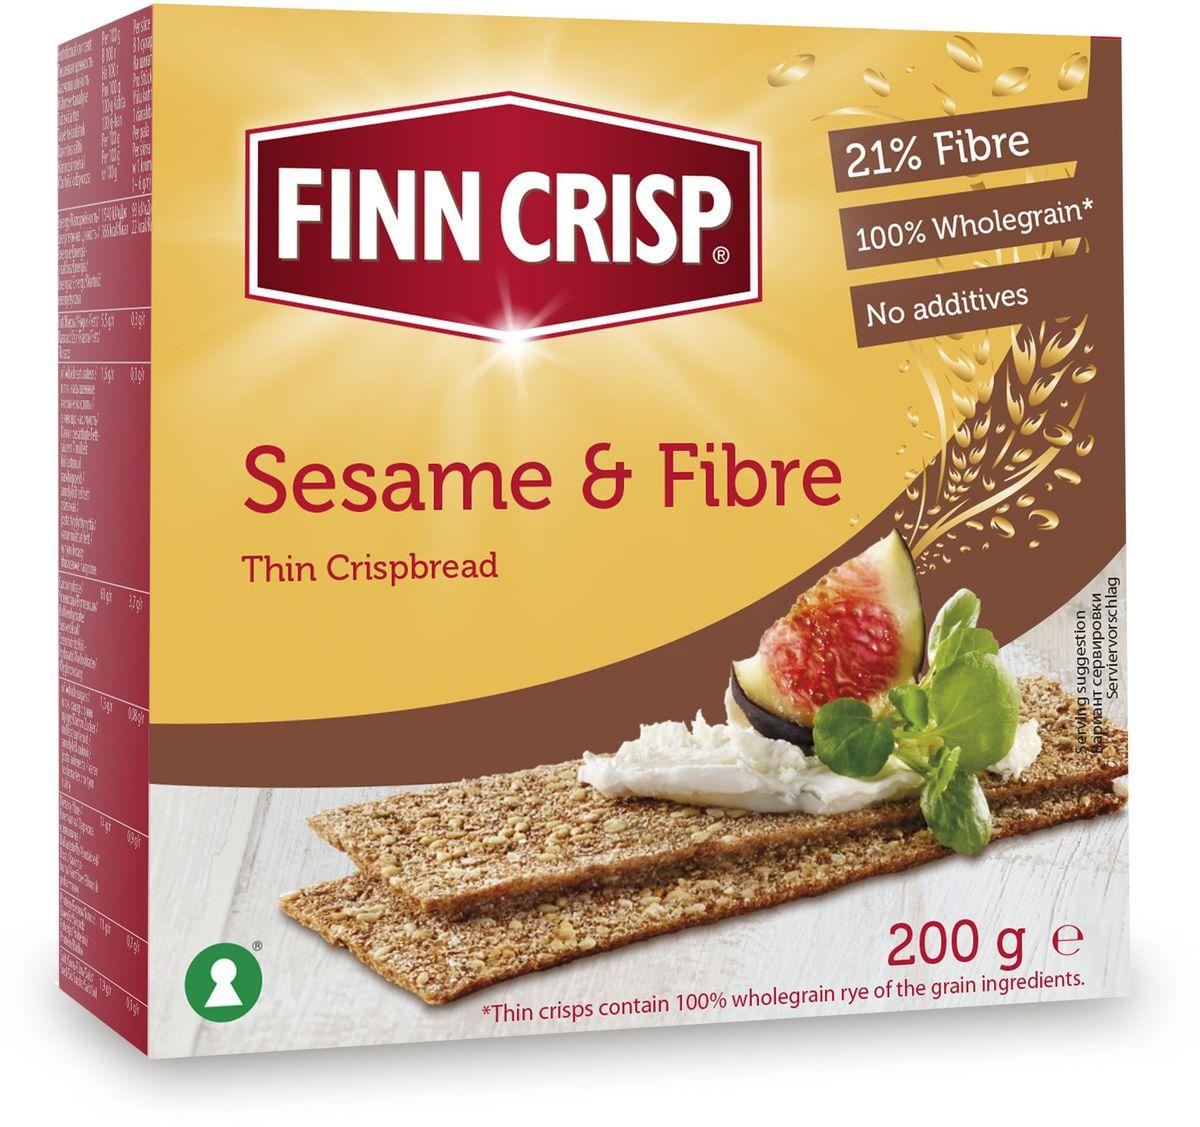 Finn Crisp Sesame&Fibre хлебцы кунжут и отруби, 200 г20246